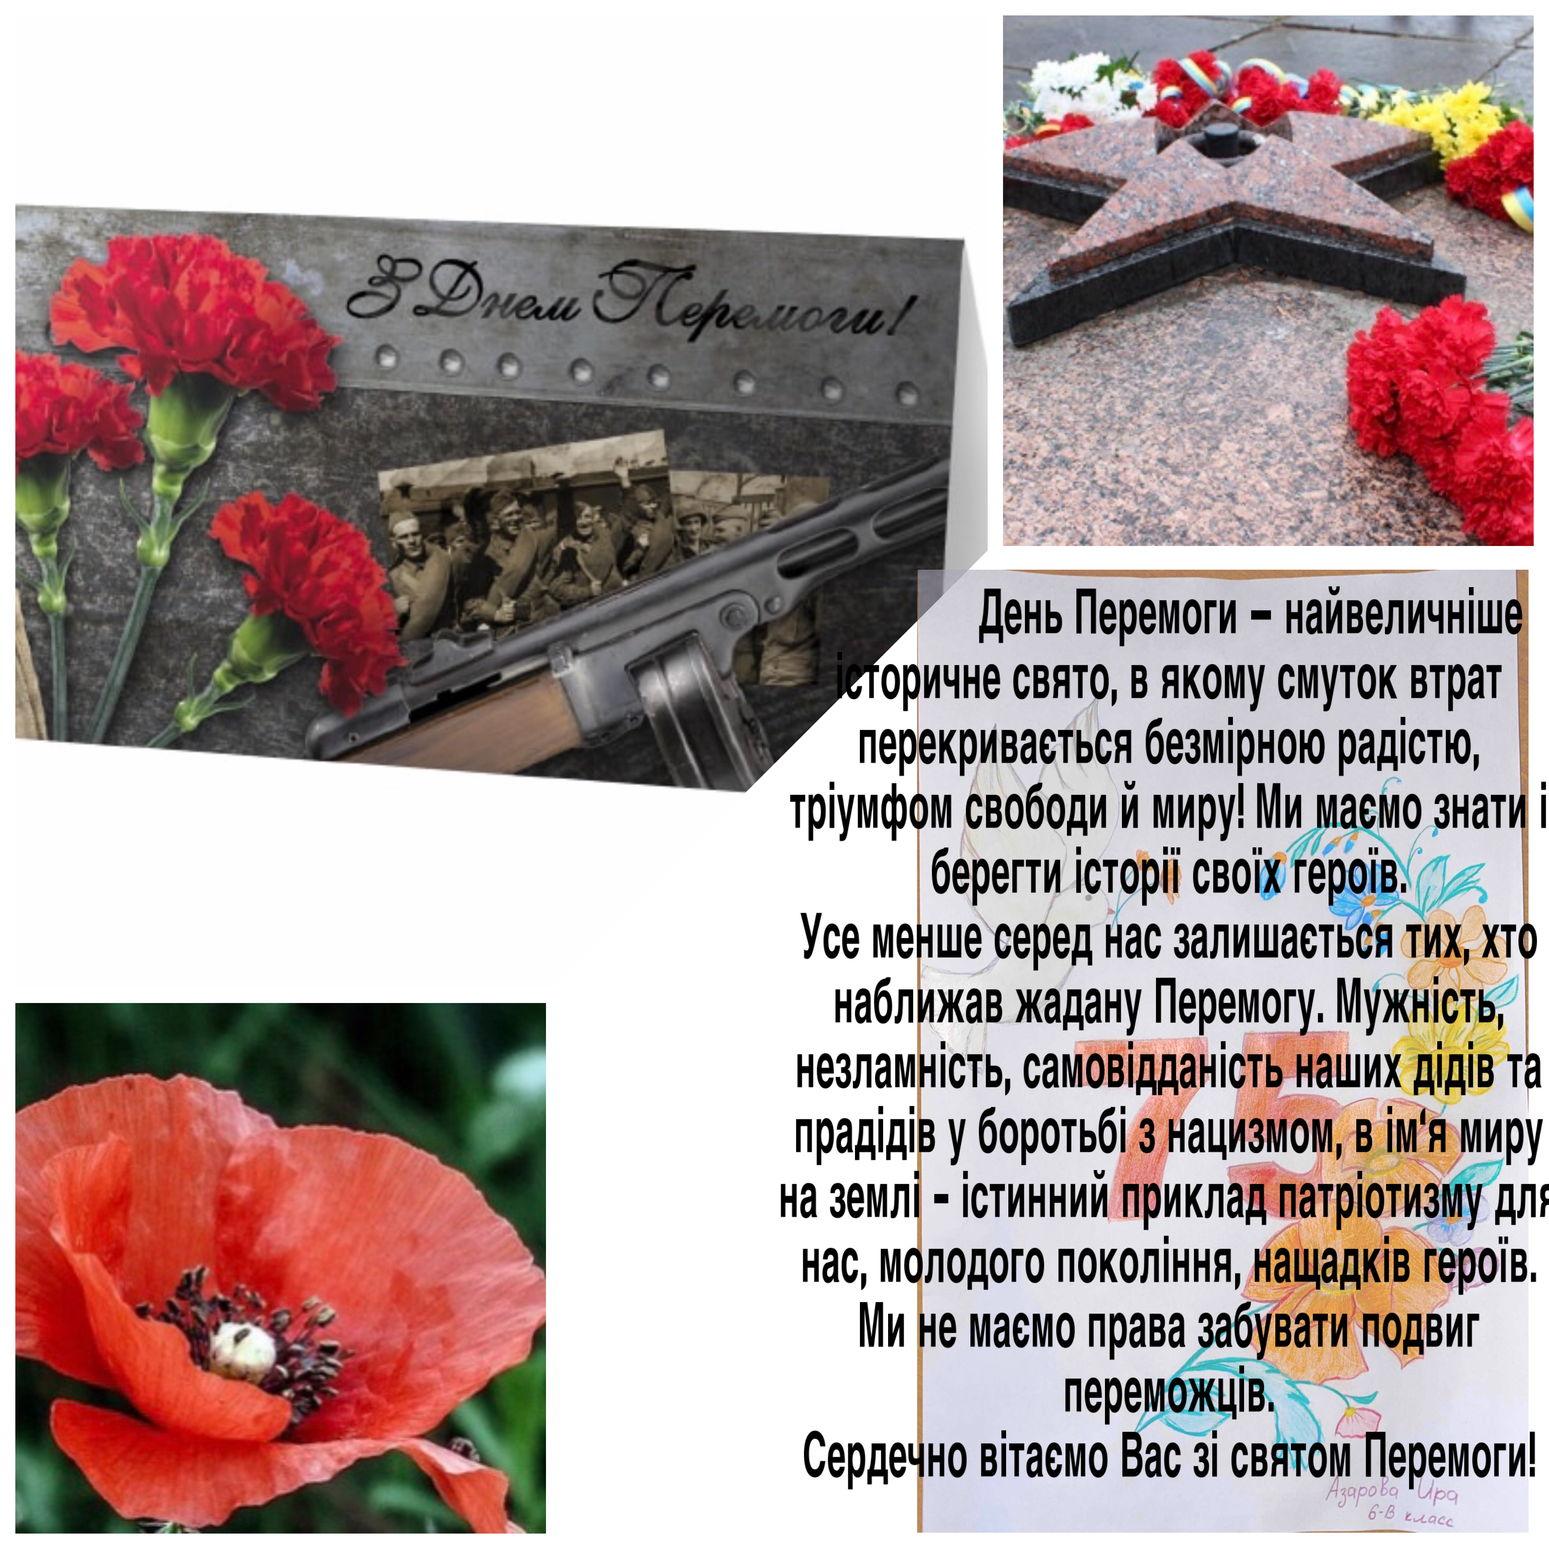 http://kharkivschool3.at.ua/novs/2019-2020/05/imgonline-com-ua-Compressed-3xwQekwRAOyLSrN.jpg